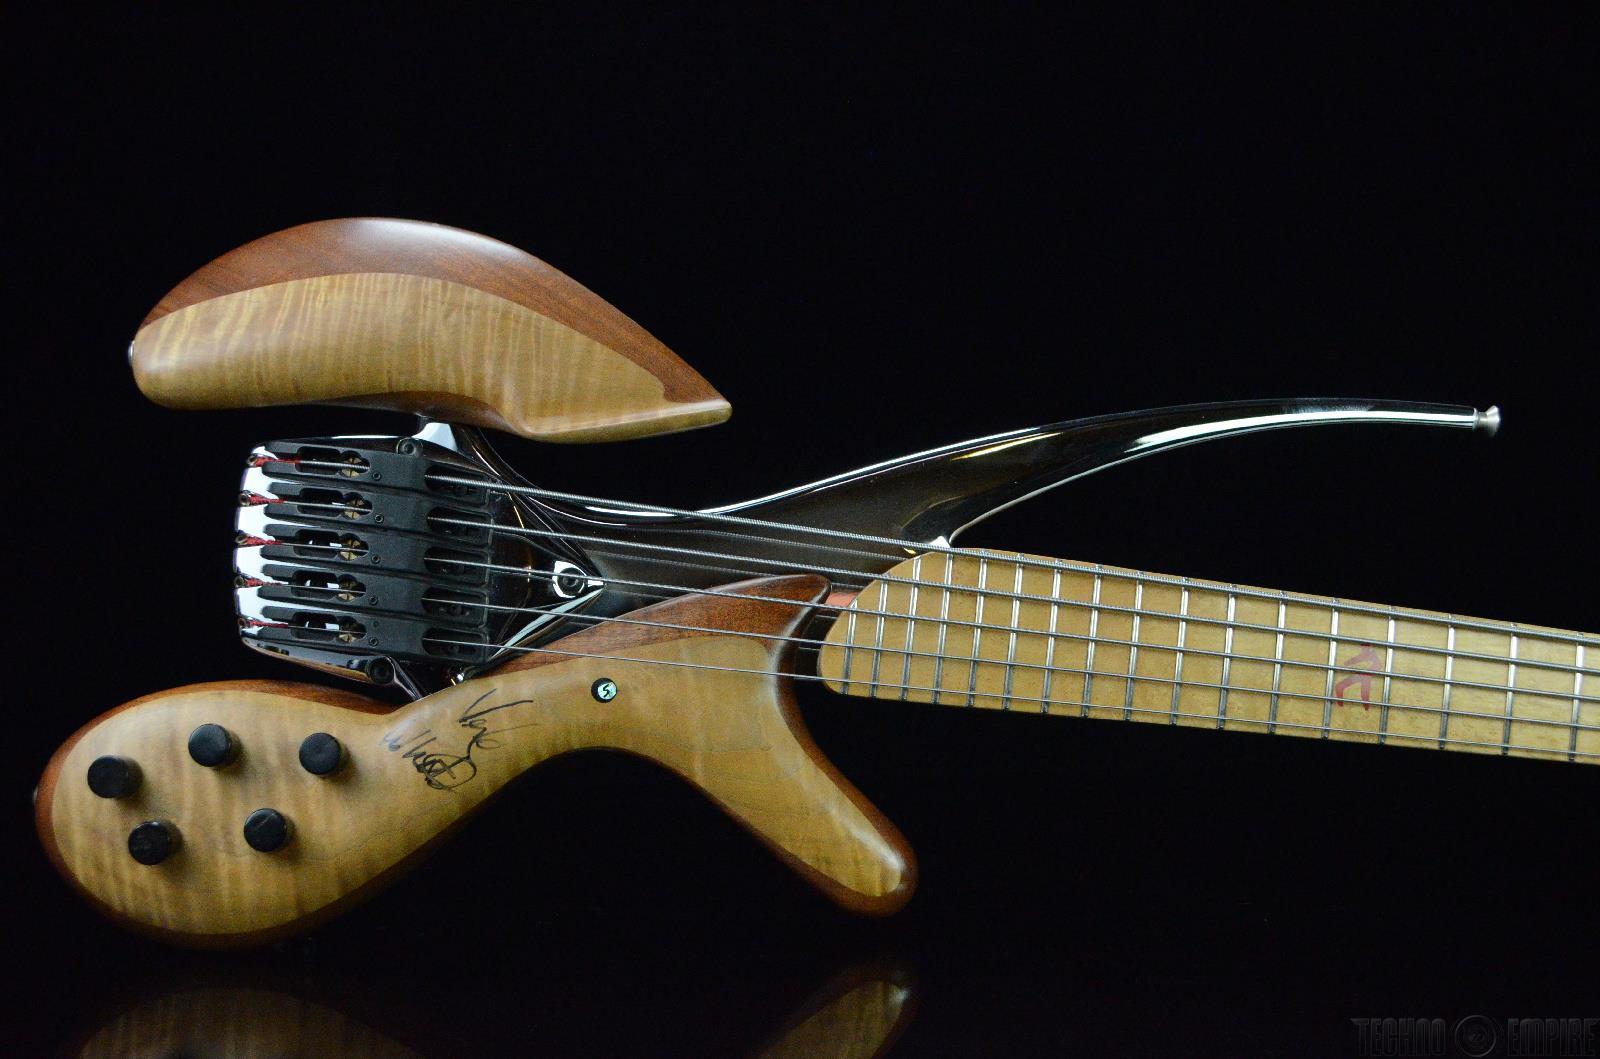 spalt magma x501 5 string electric bass guitar signed by verdine white 17869 ebay. Black Bedroom Furniture Sets. Home Design Ideas